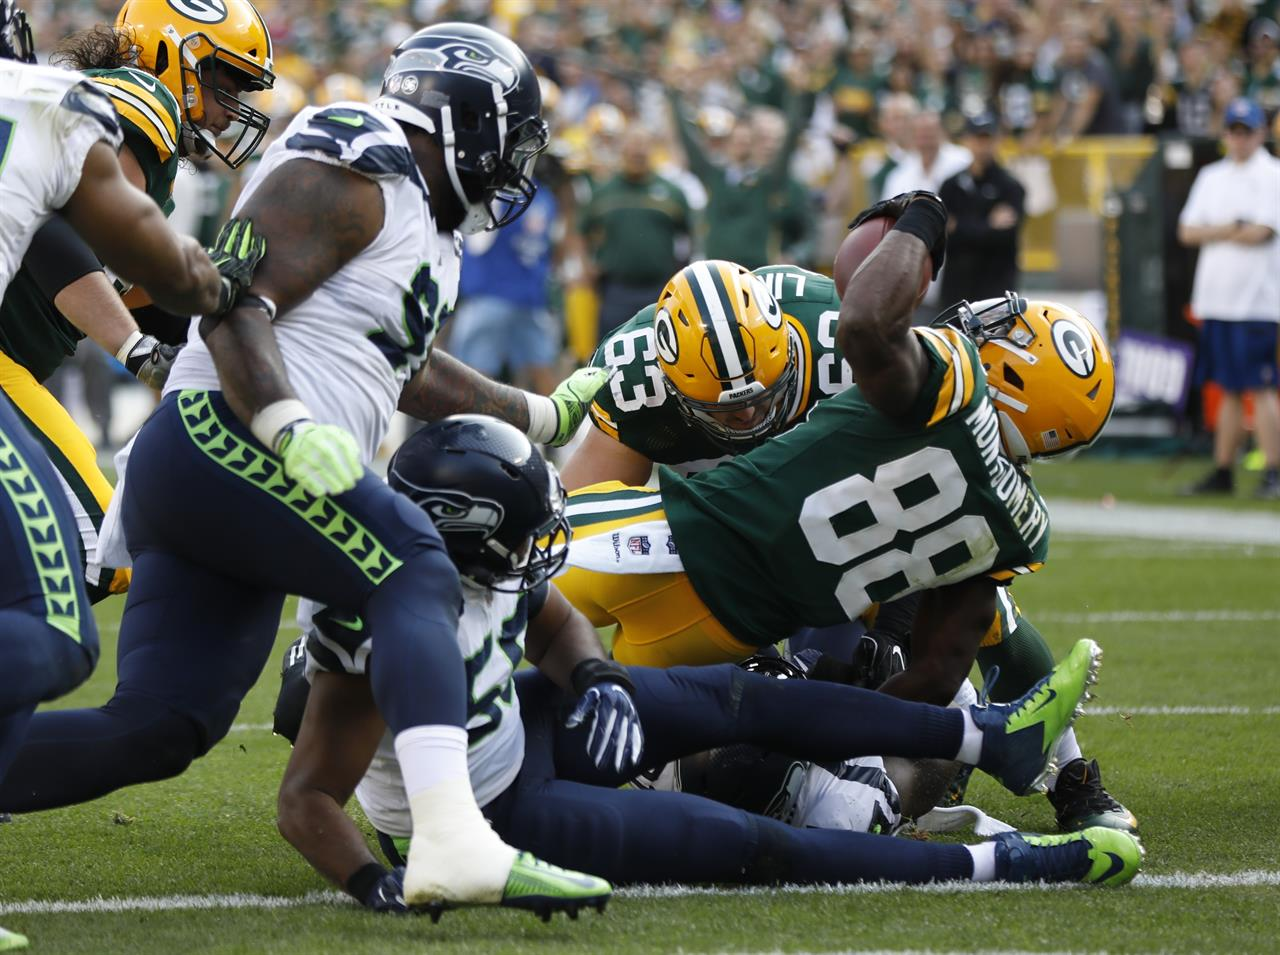 Packers beat Seahawks 17-9 to take NFC heavyweight match